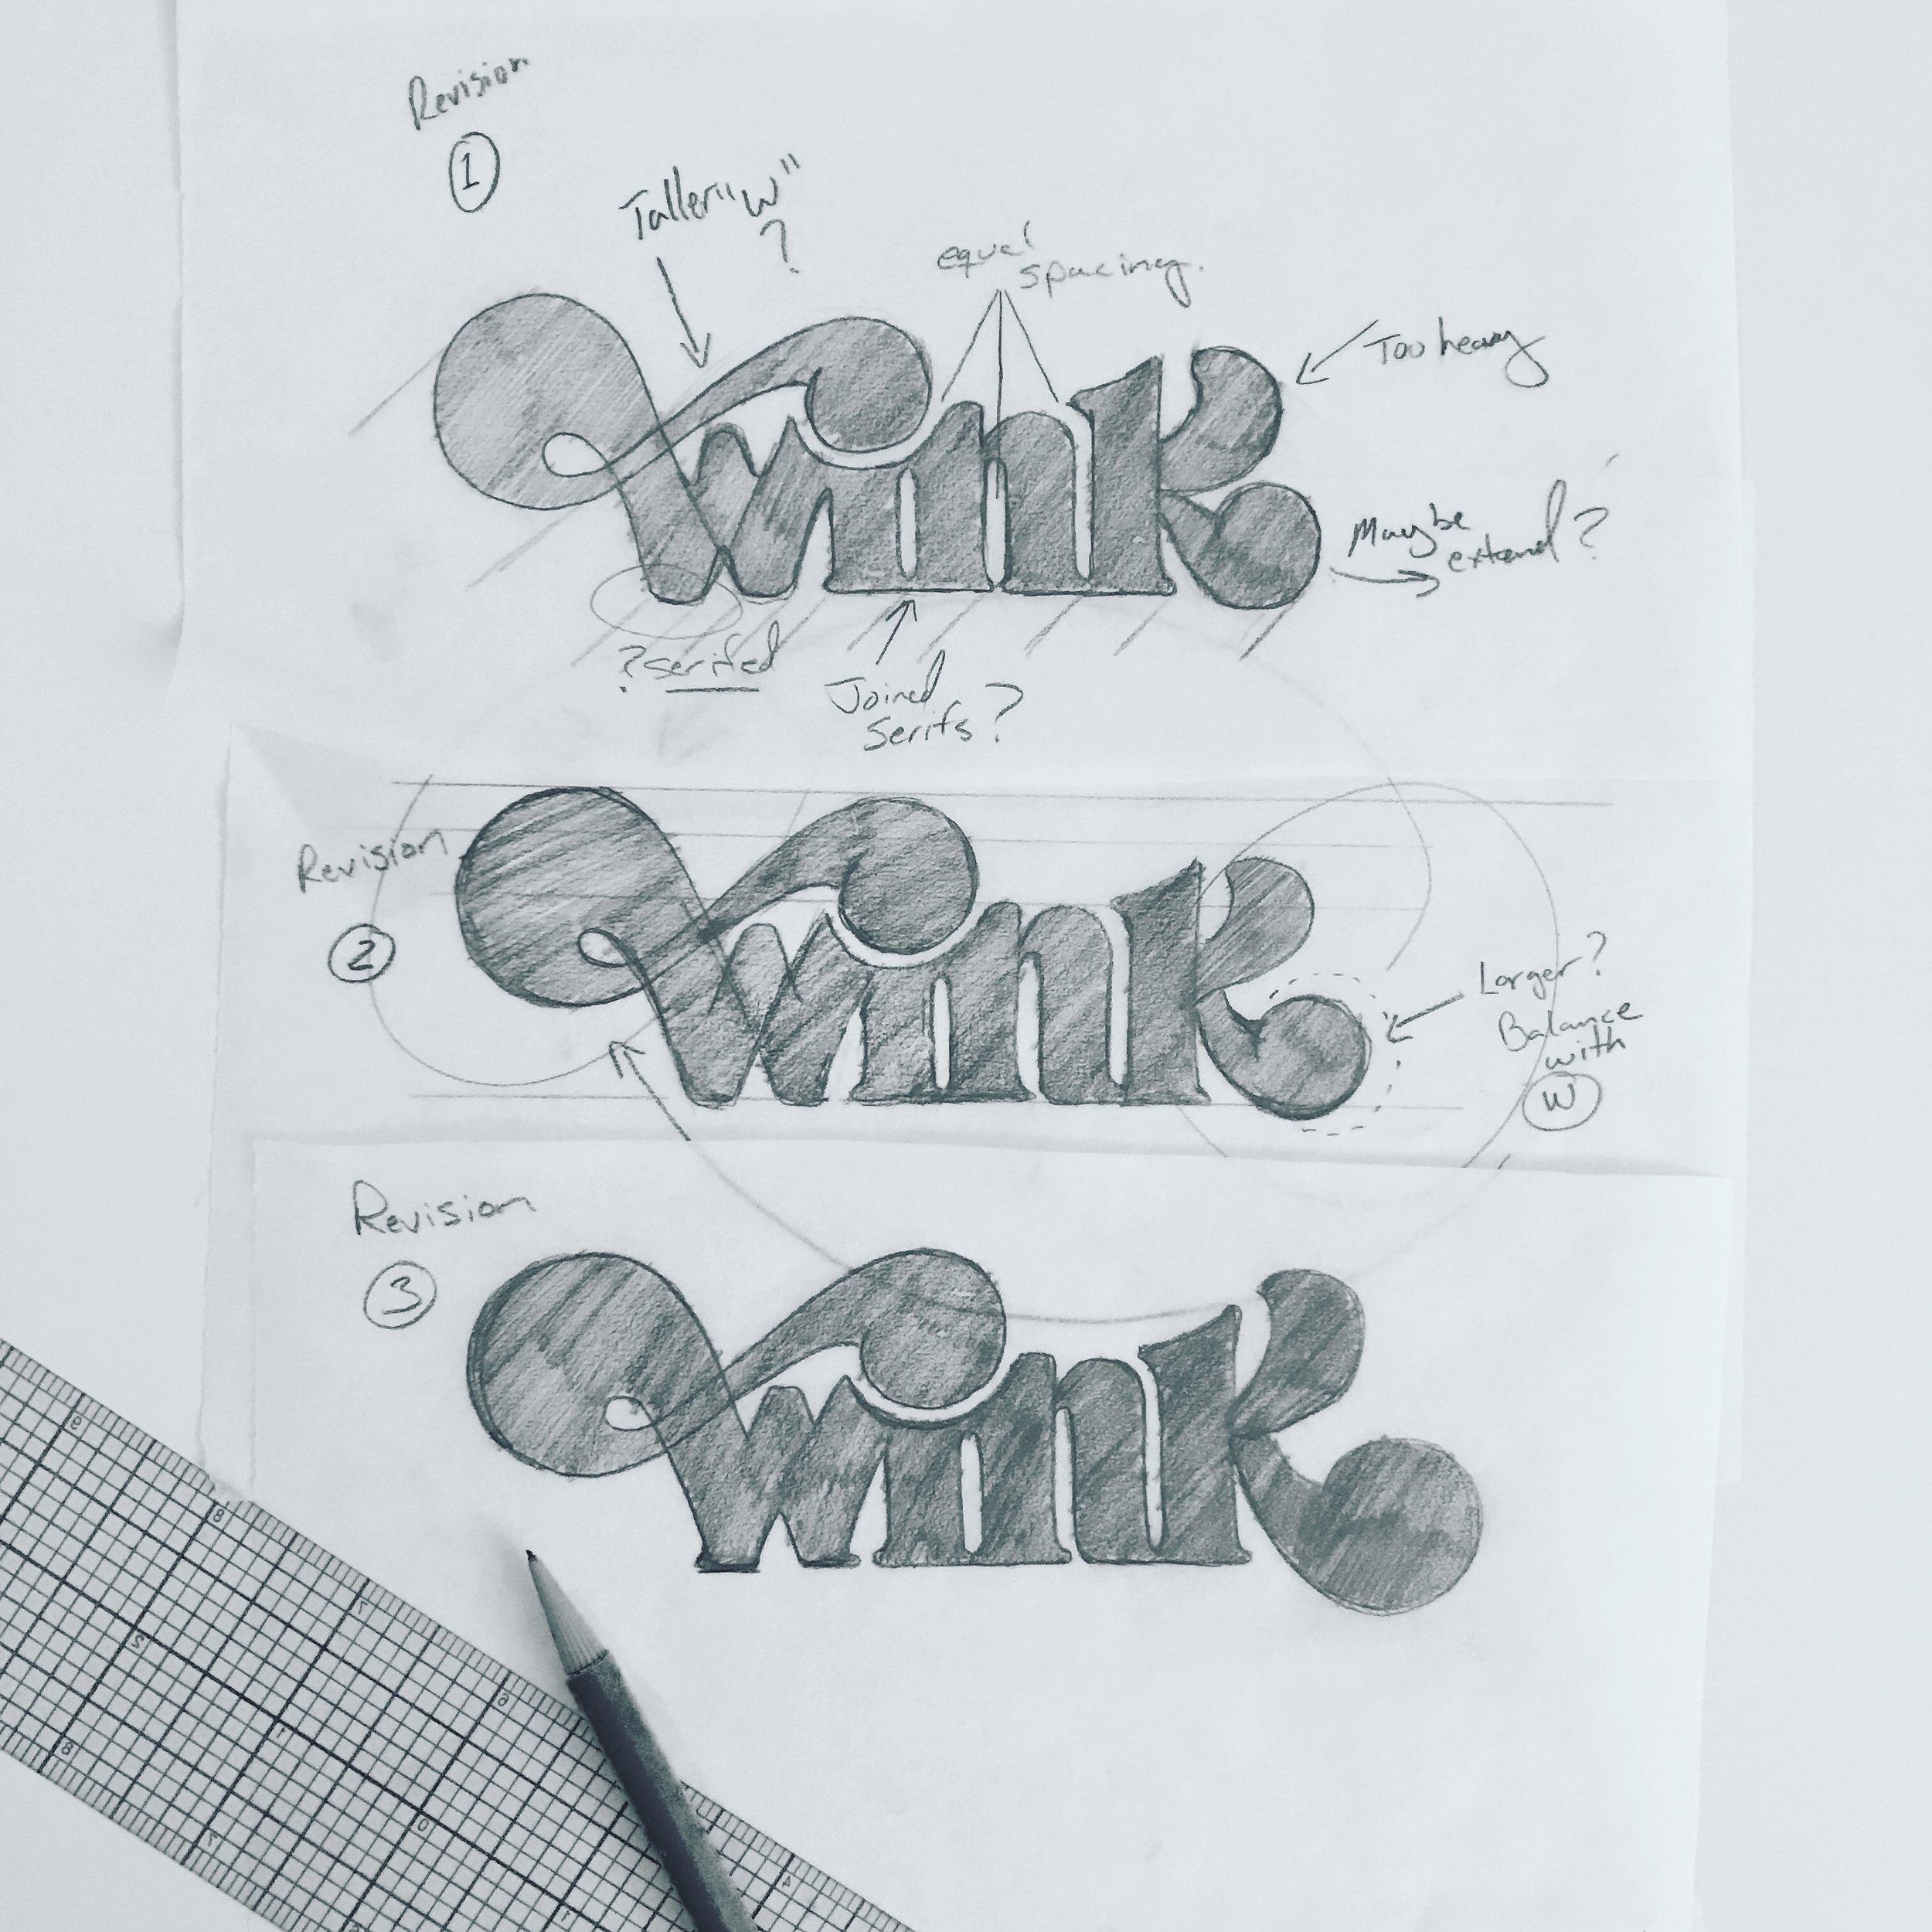 Wink sketches